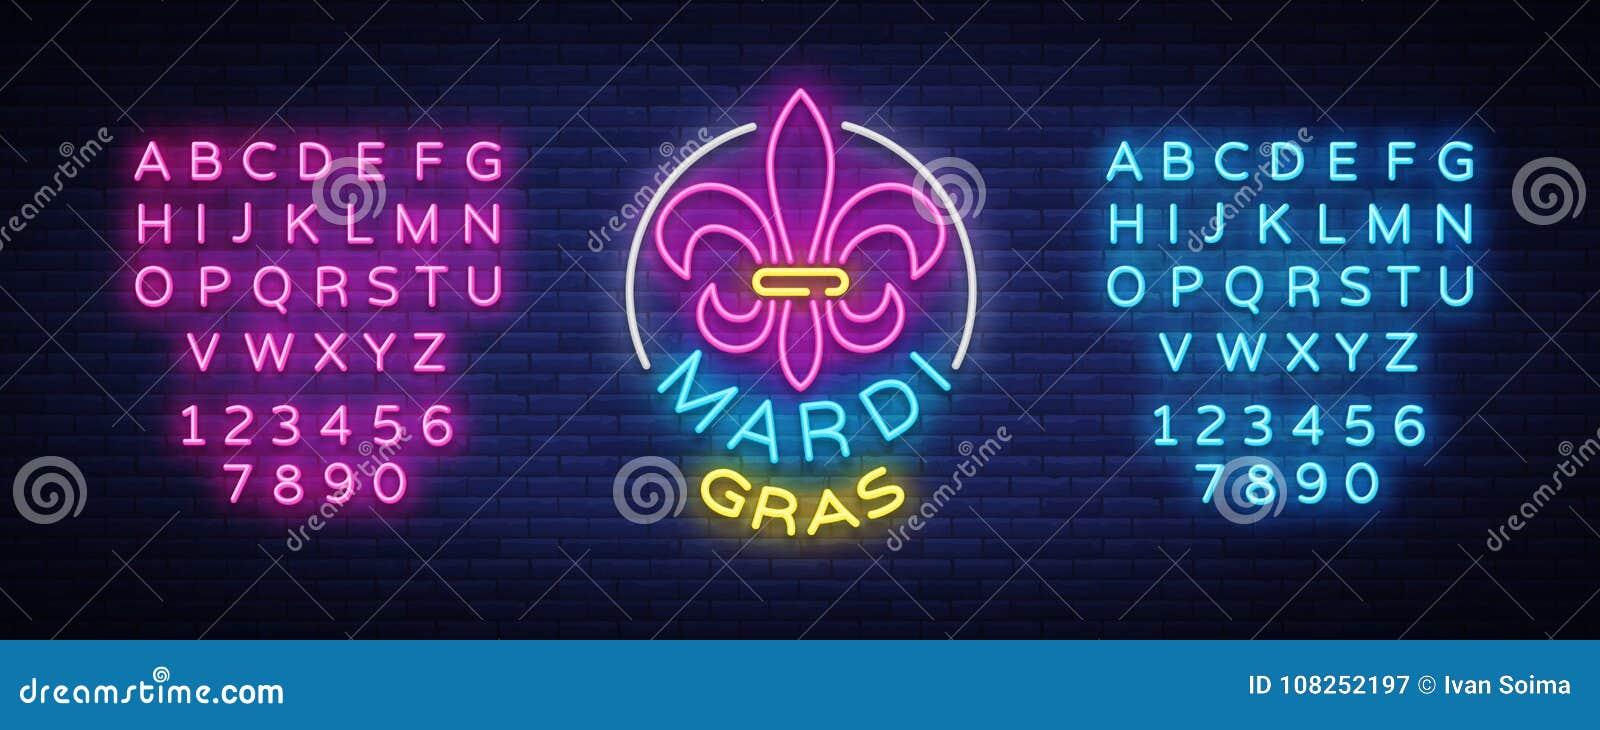 Mardi Grav是一个霓虹灯广告 明亮的发光的横幅,霓虹广告牌,狂欢节霓虹广告  肥胖星期二设计